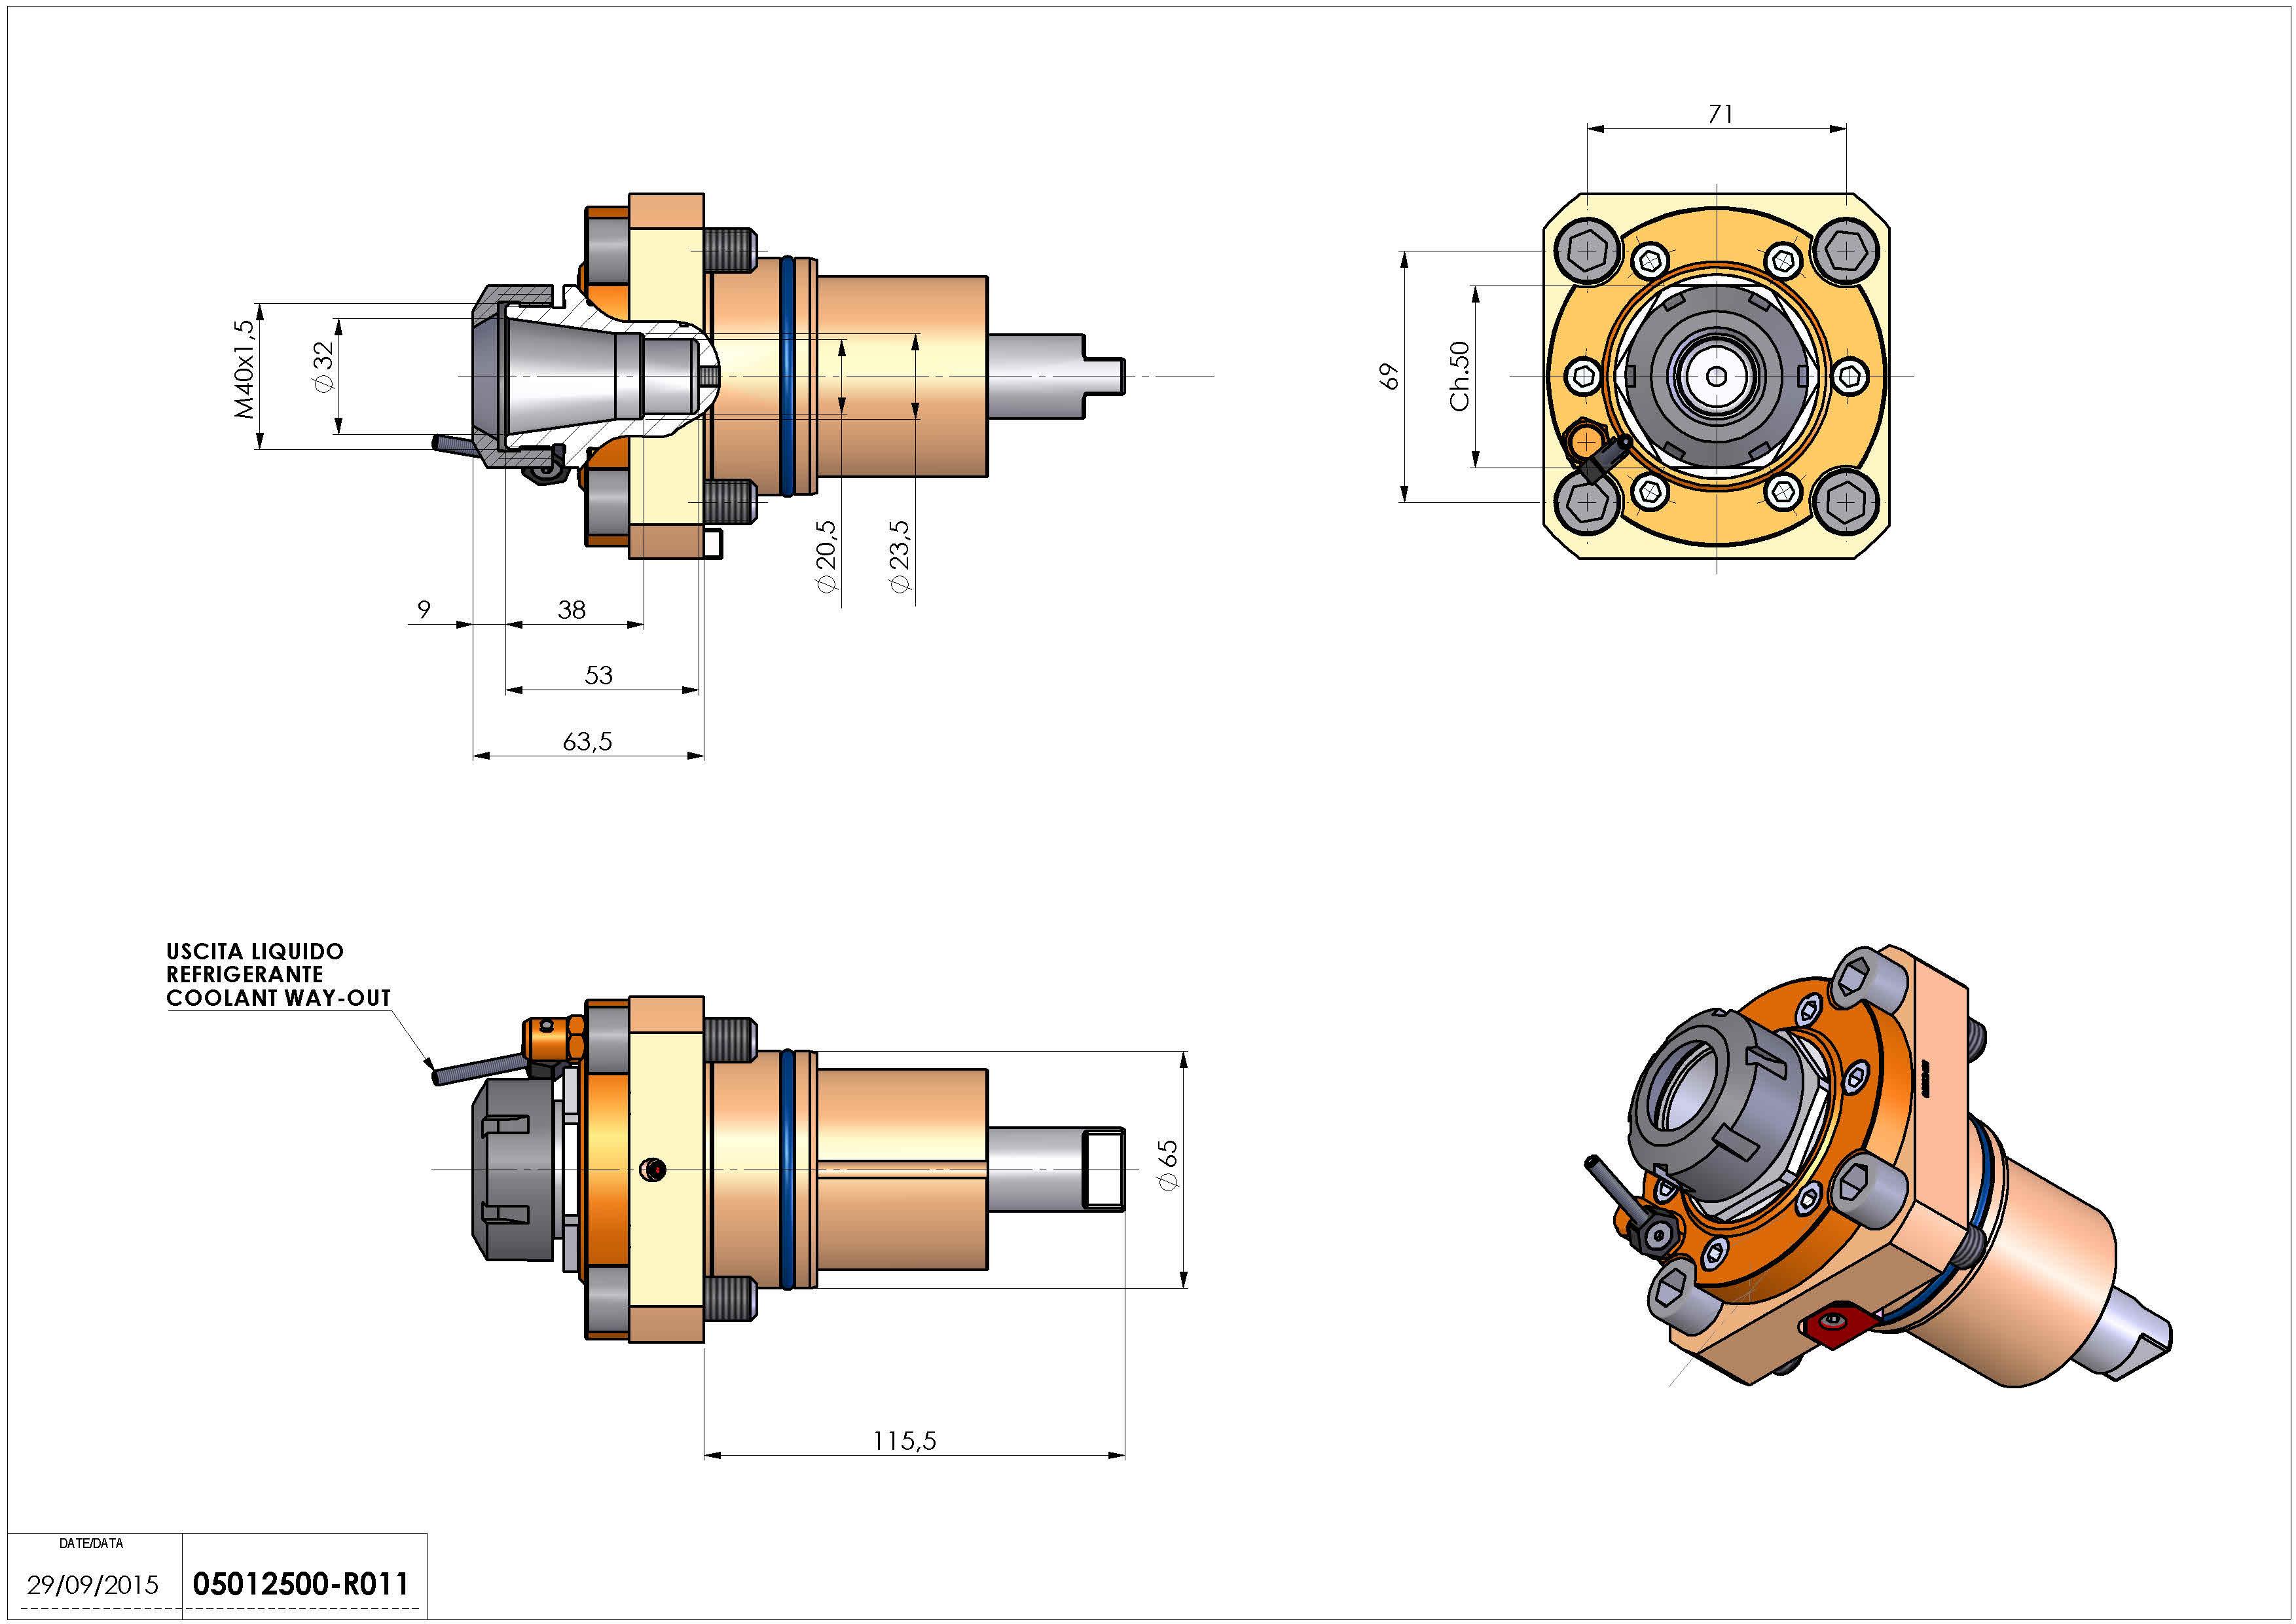 Technical image - LT-S D65 ER32 H63.5 NK.